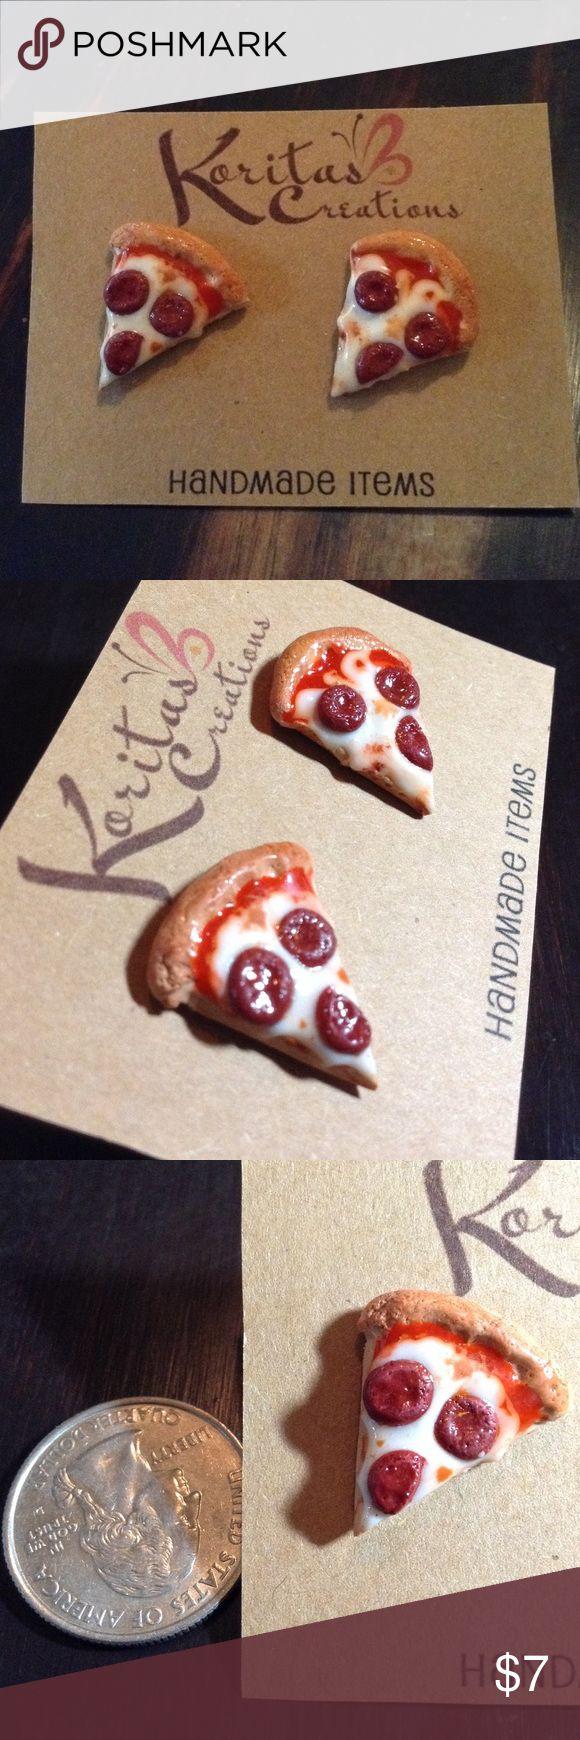 Pizza earrings studs New Handmade One of a kind Pizza earrings, made out of polymer clay. Smoke Free Home  Handmade Jewelry Earrings